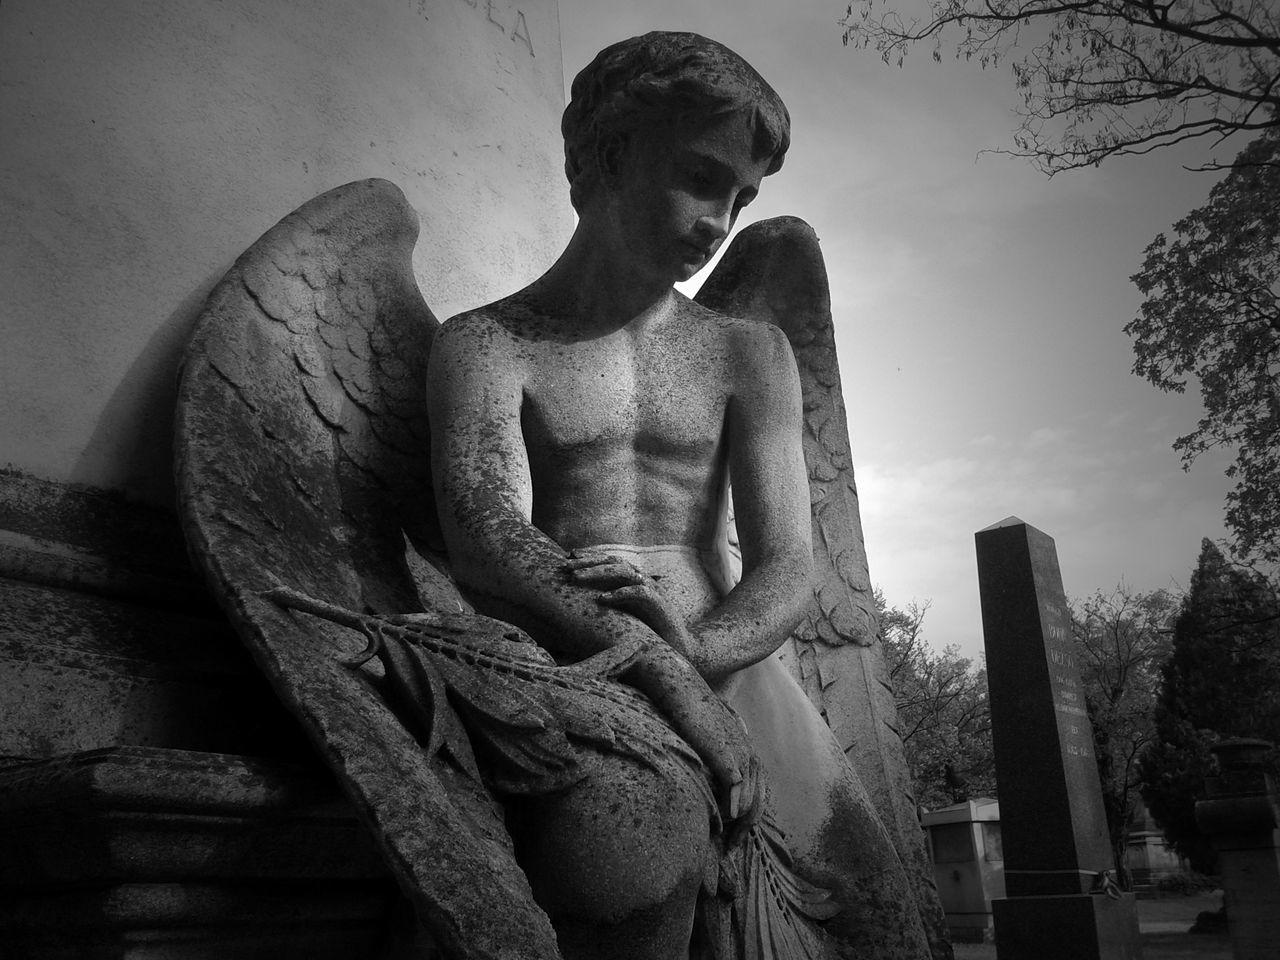 Graveyardbeauty Bnw_friday_challenge Seraphin & Seraphim Dirtyangel